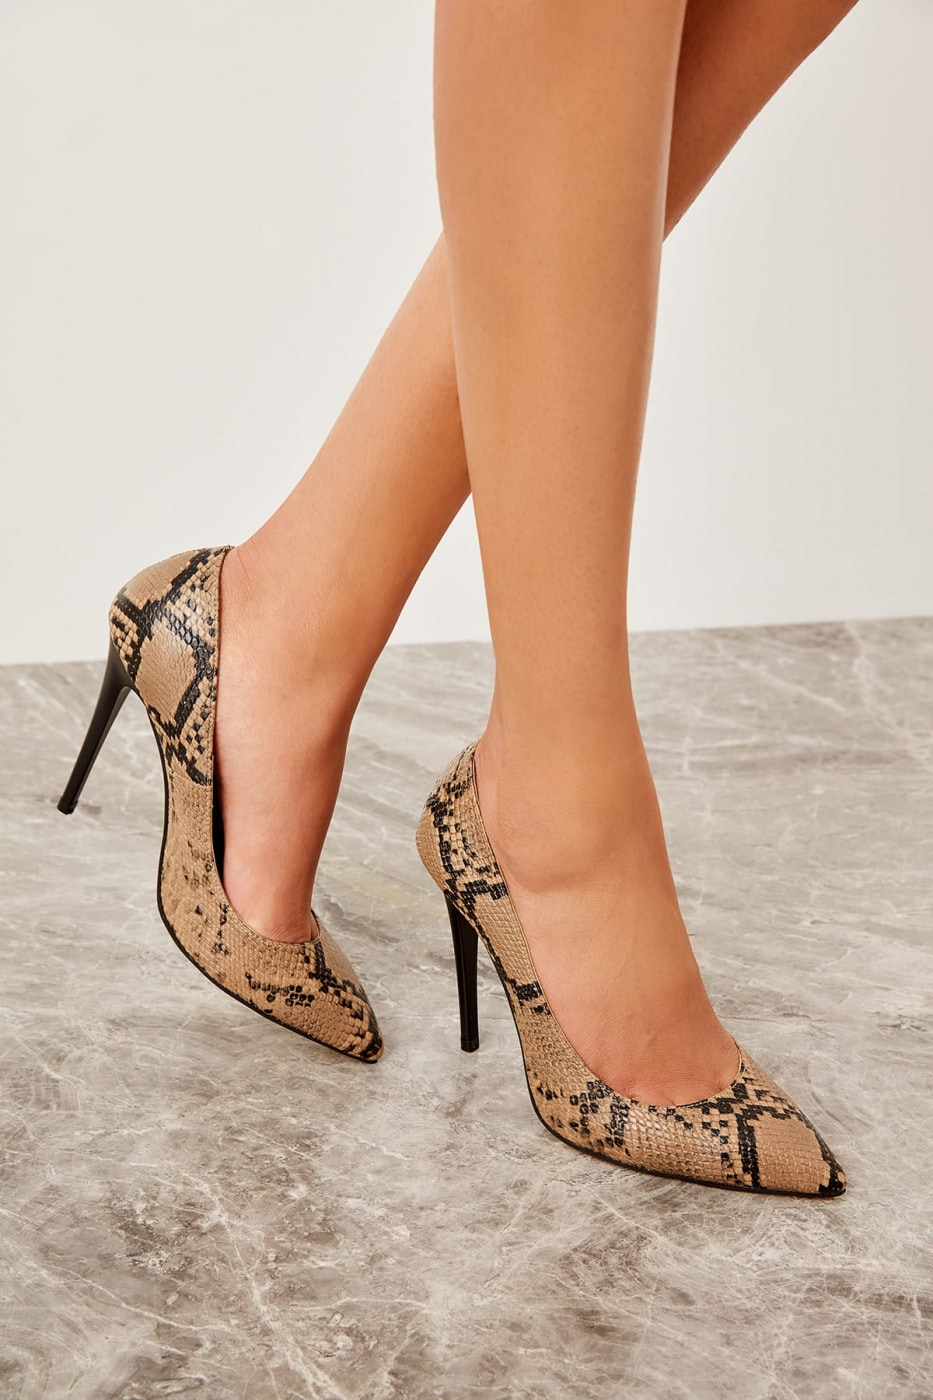 Trendyol Beige Snake-Patterned Women's Wedge-Heeled Shoes